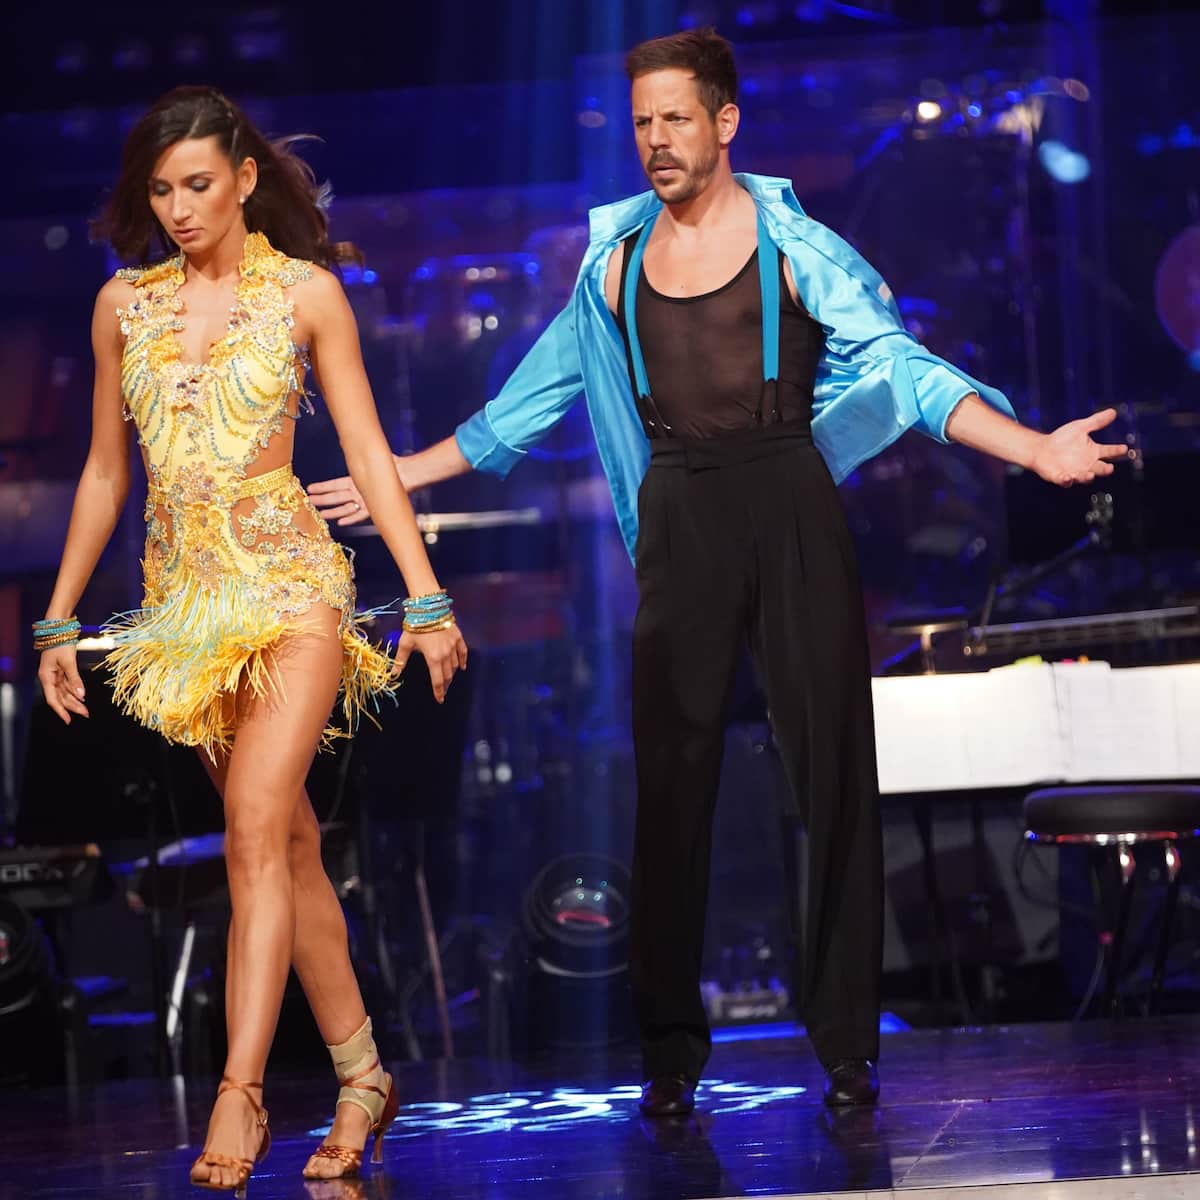 Vesela Dimova - Bernhard Kohl bei den Dancing Stars am 8.10.2021